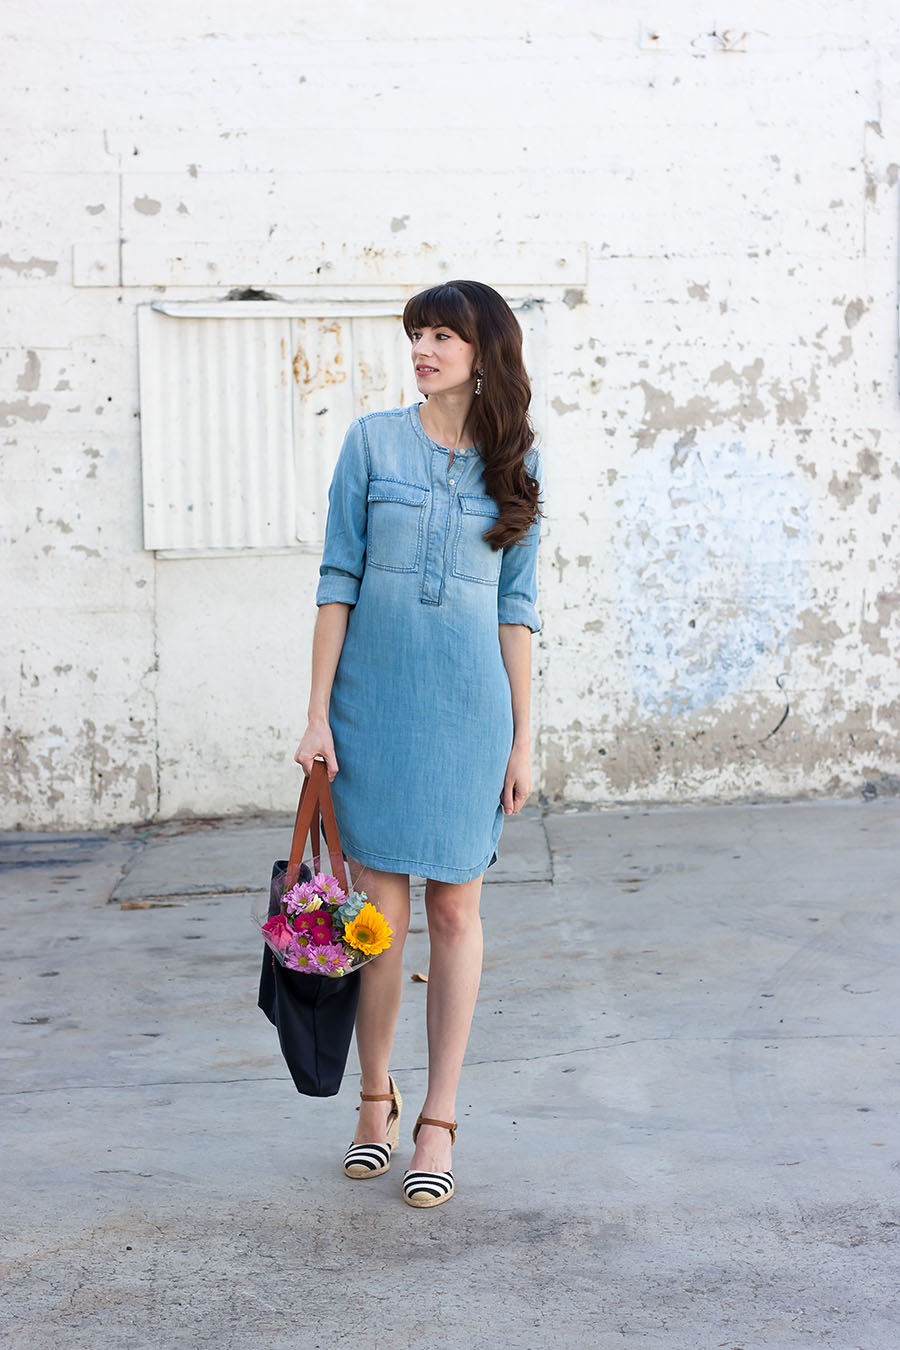 J.Crew Dress, Summer Outfit